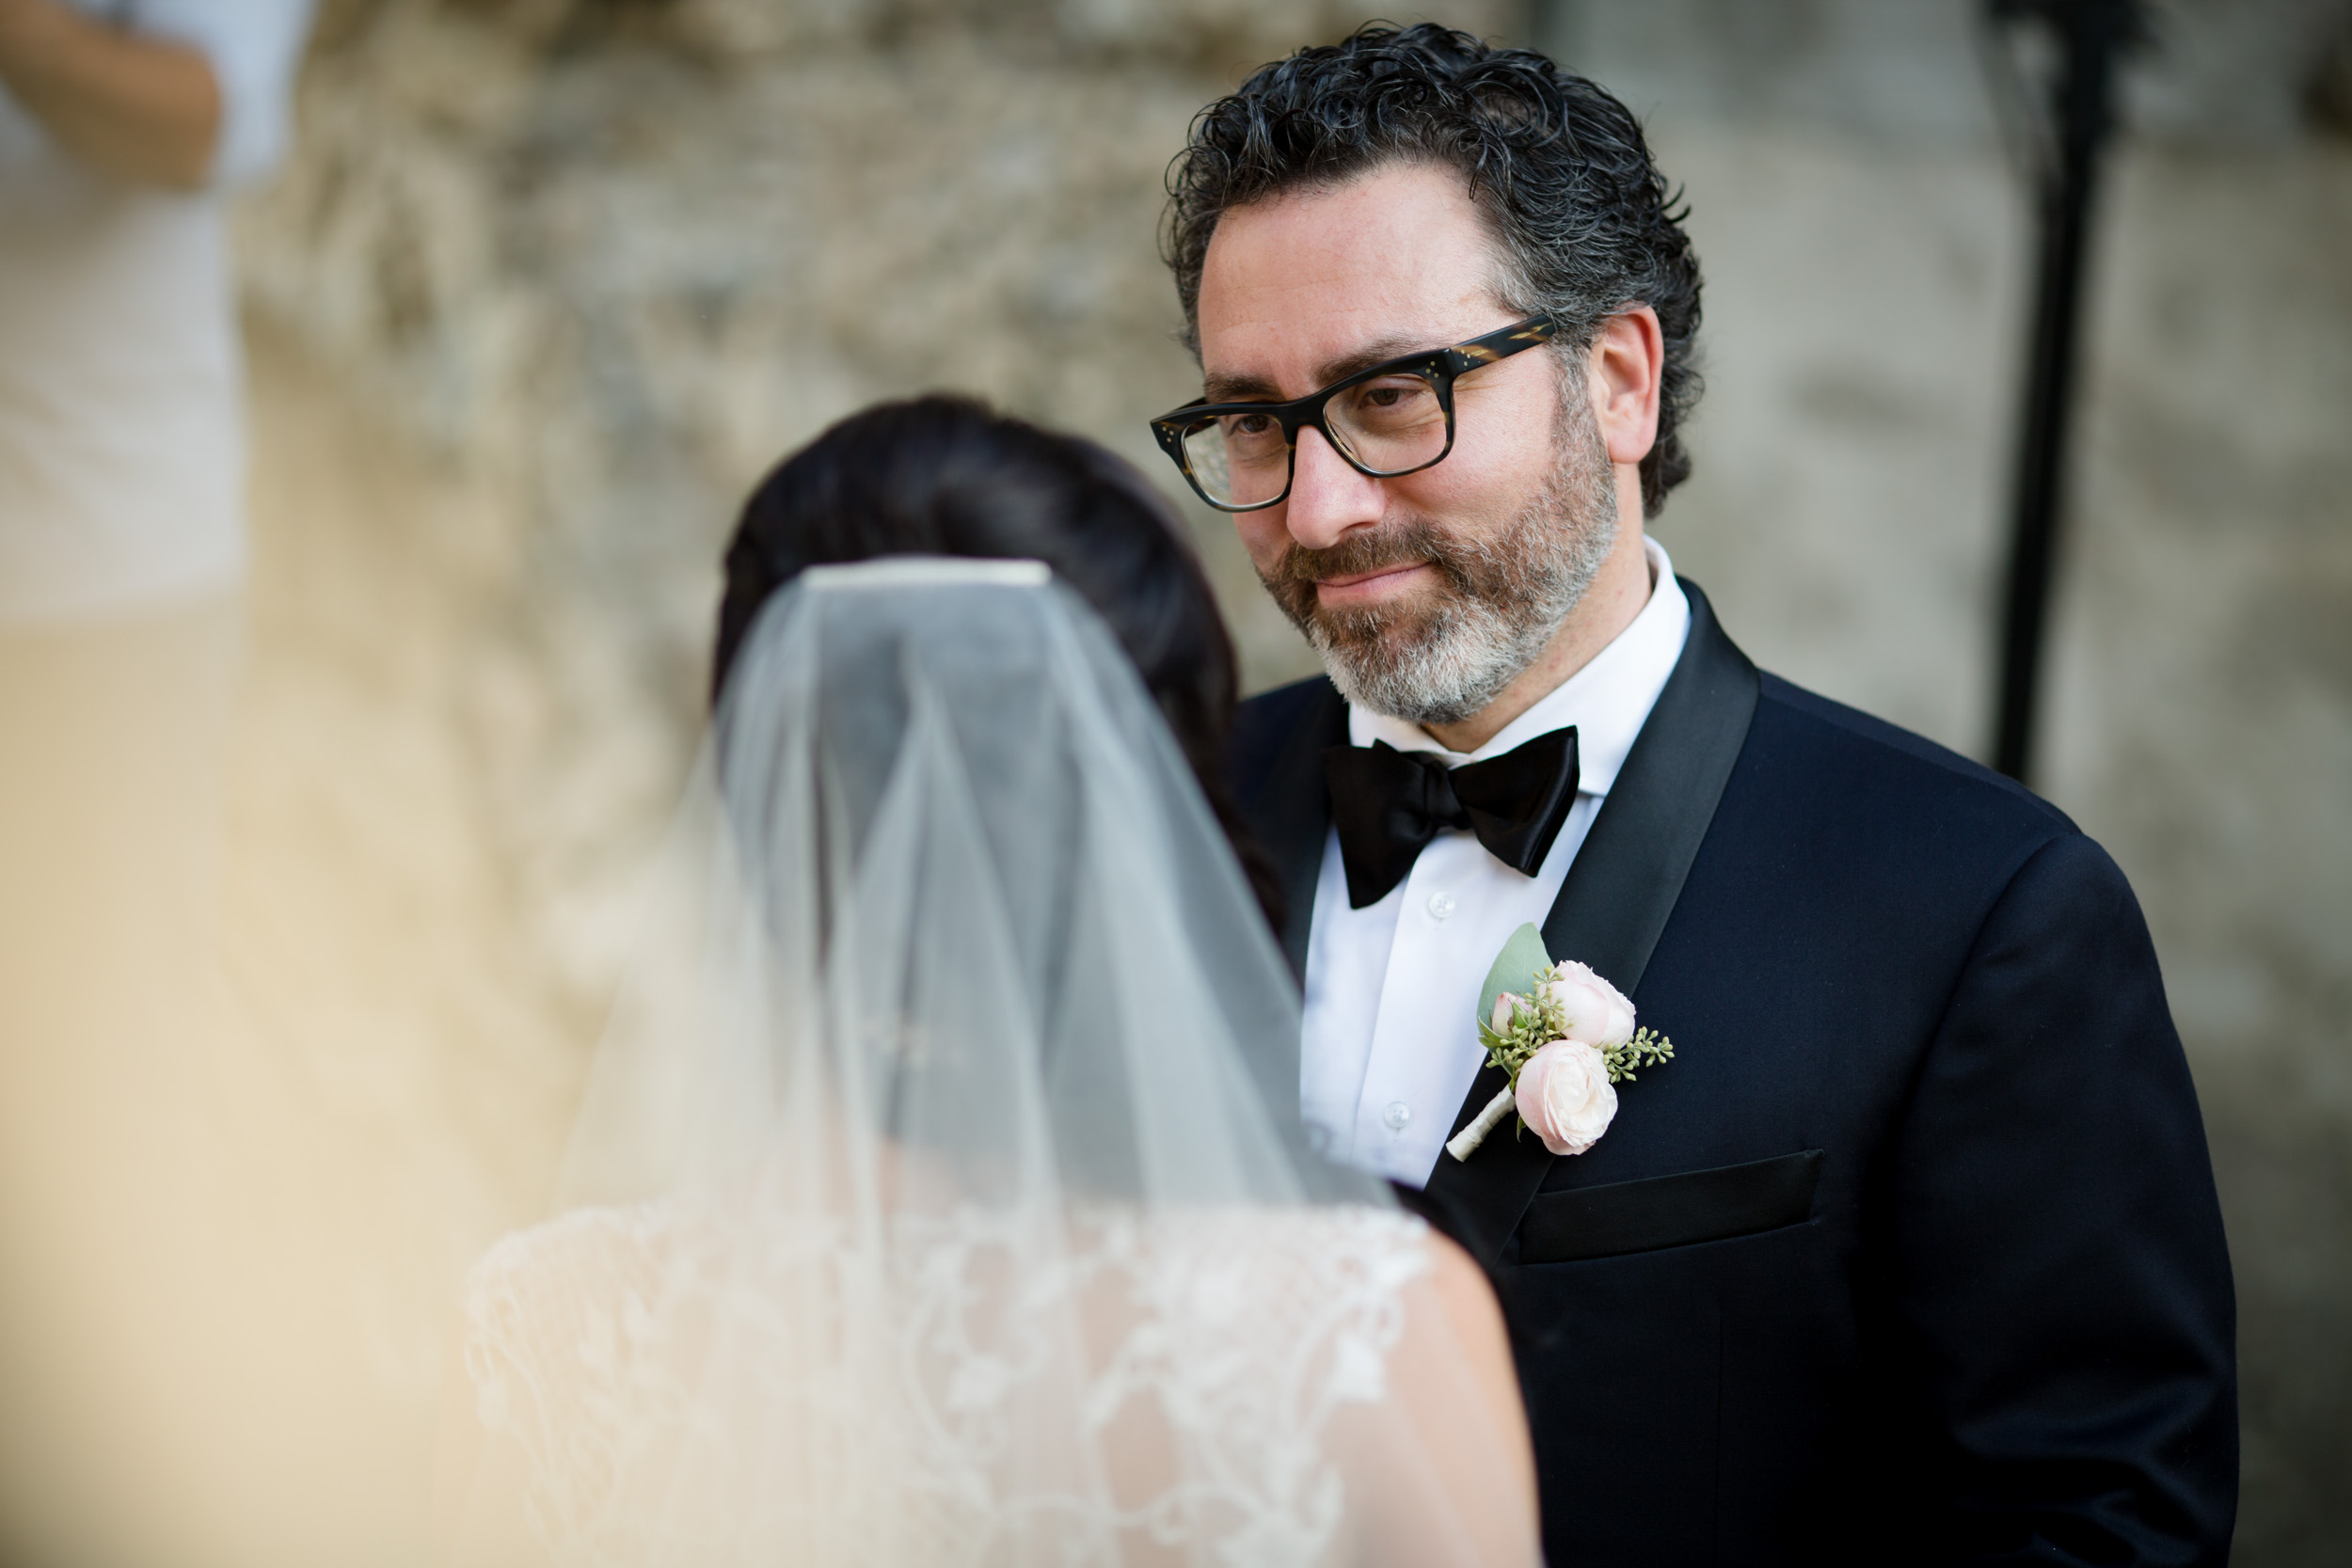 villa-gamberaia-florence-italy-destination-wedding-45.jpg